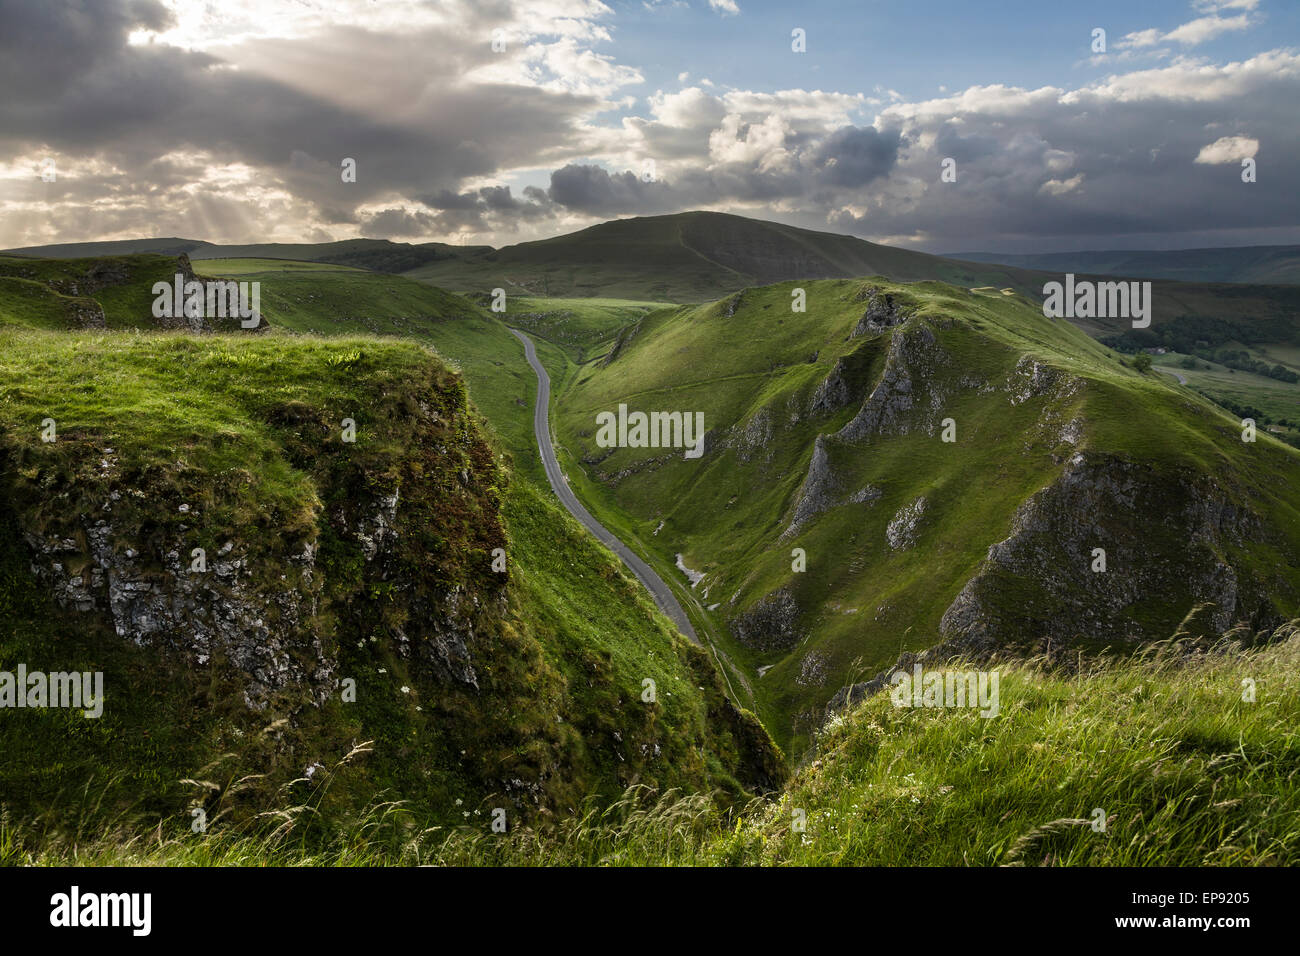 Winnats Pass, Castleton, Peak District National Park, Derbyshire, England, UK - Stock Image